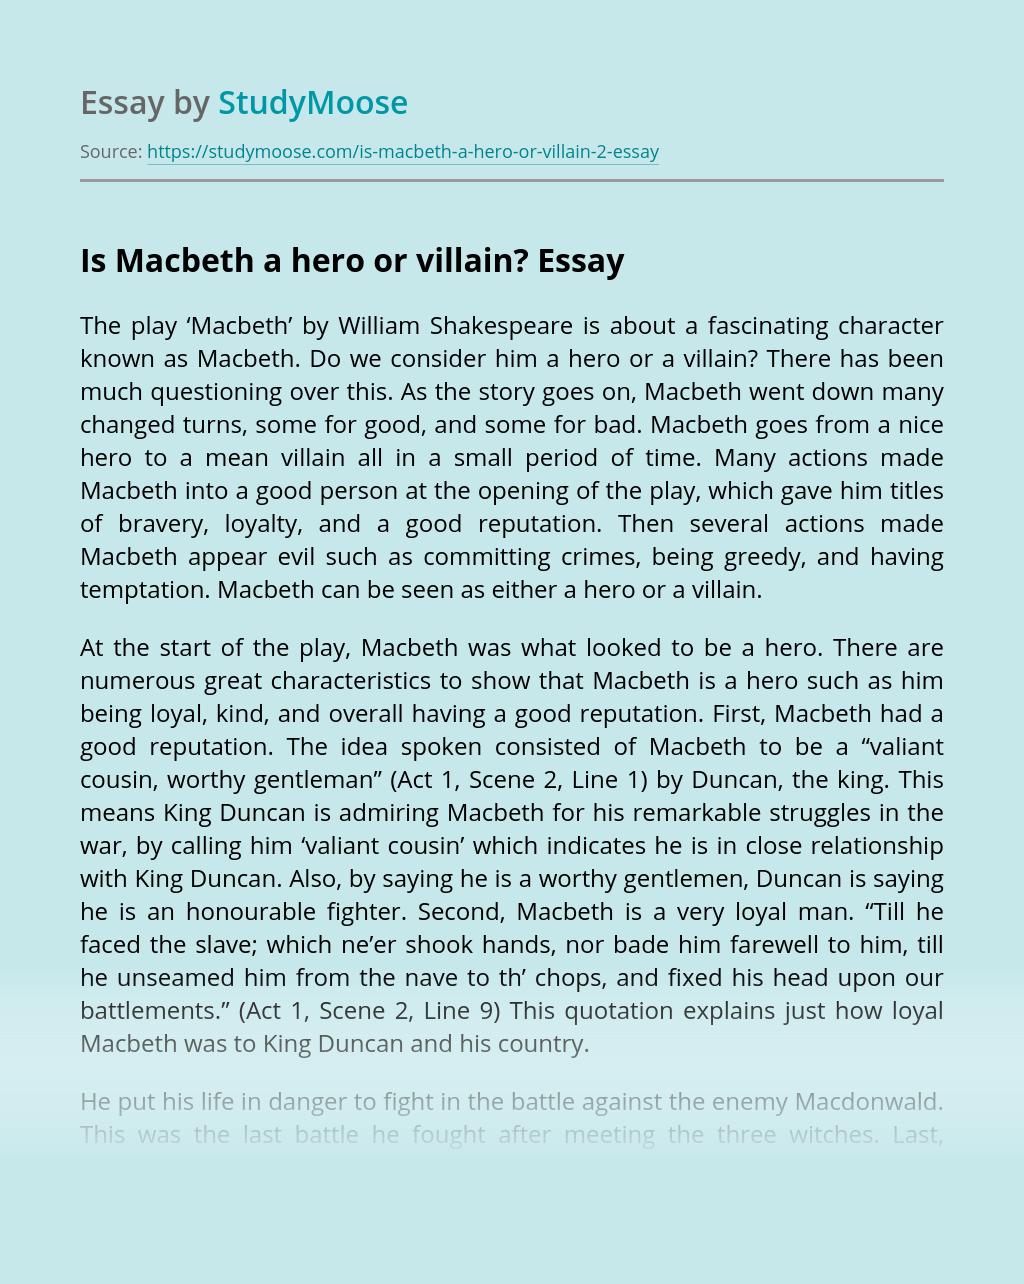 Is Macbeth a hero or villain?